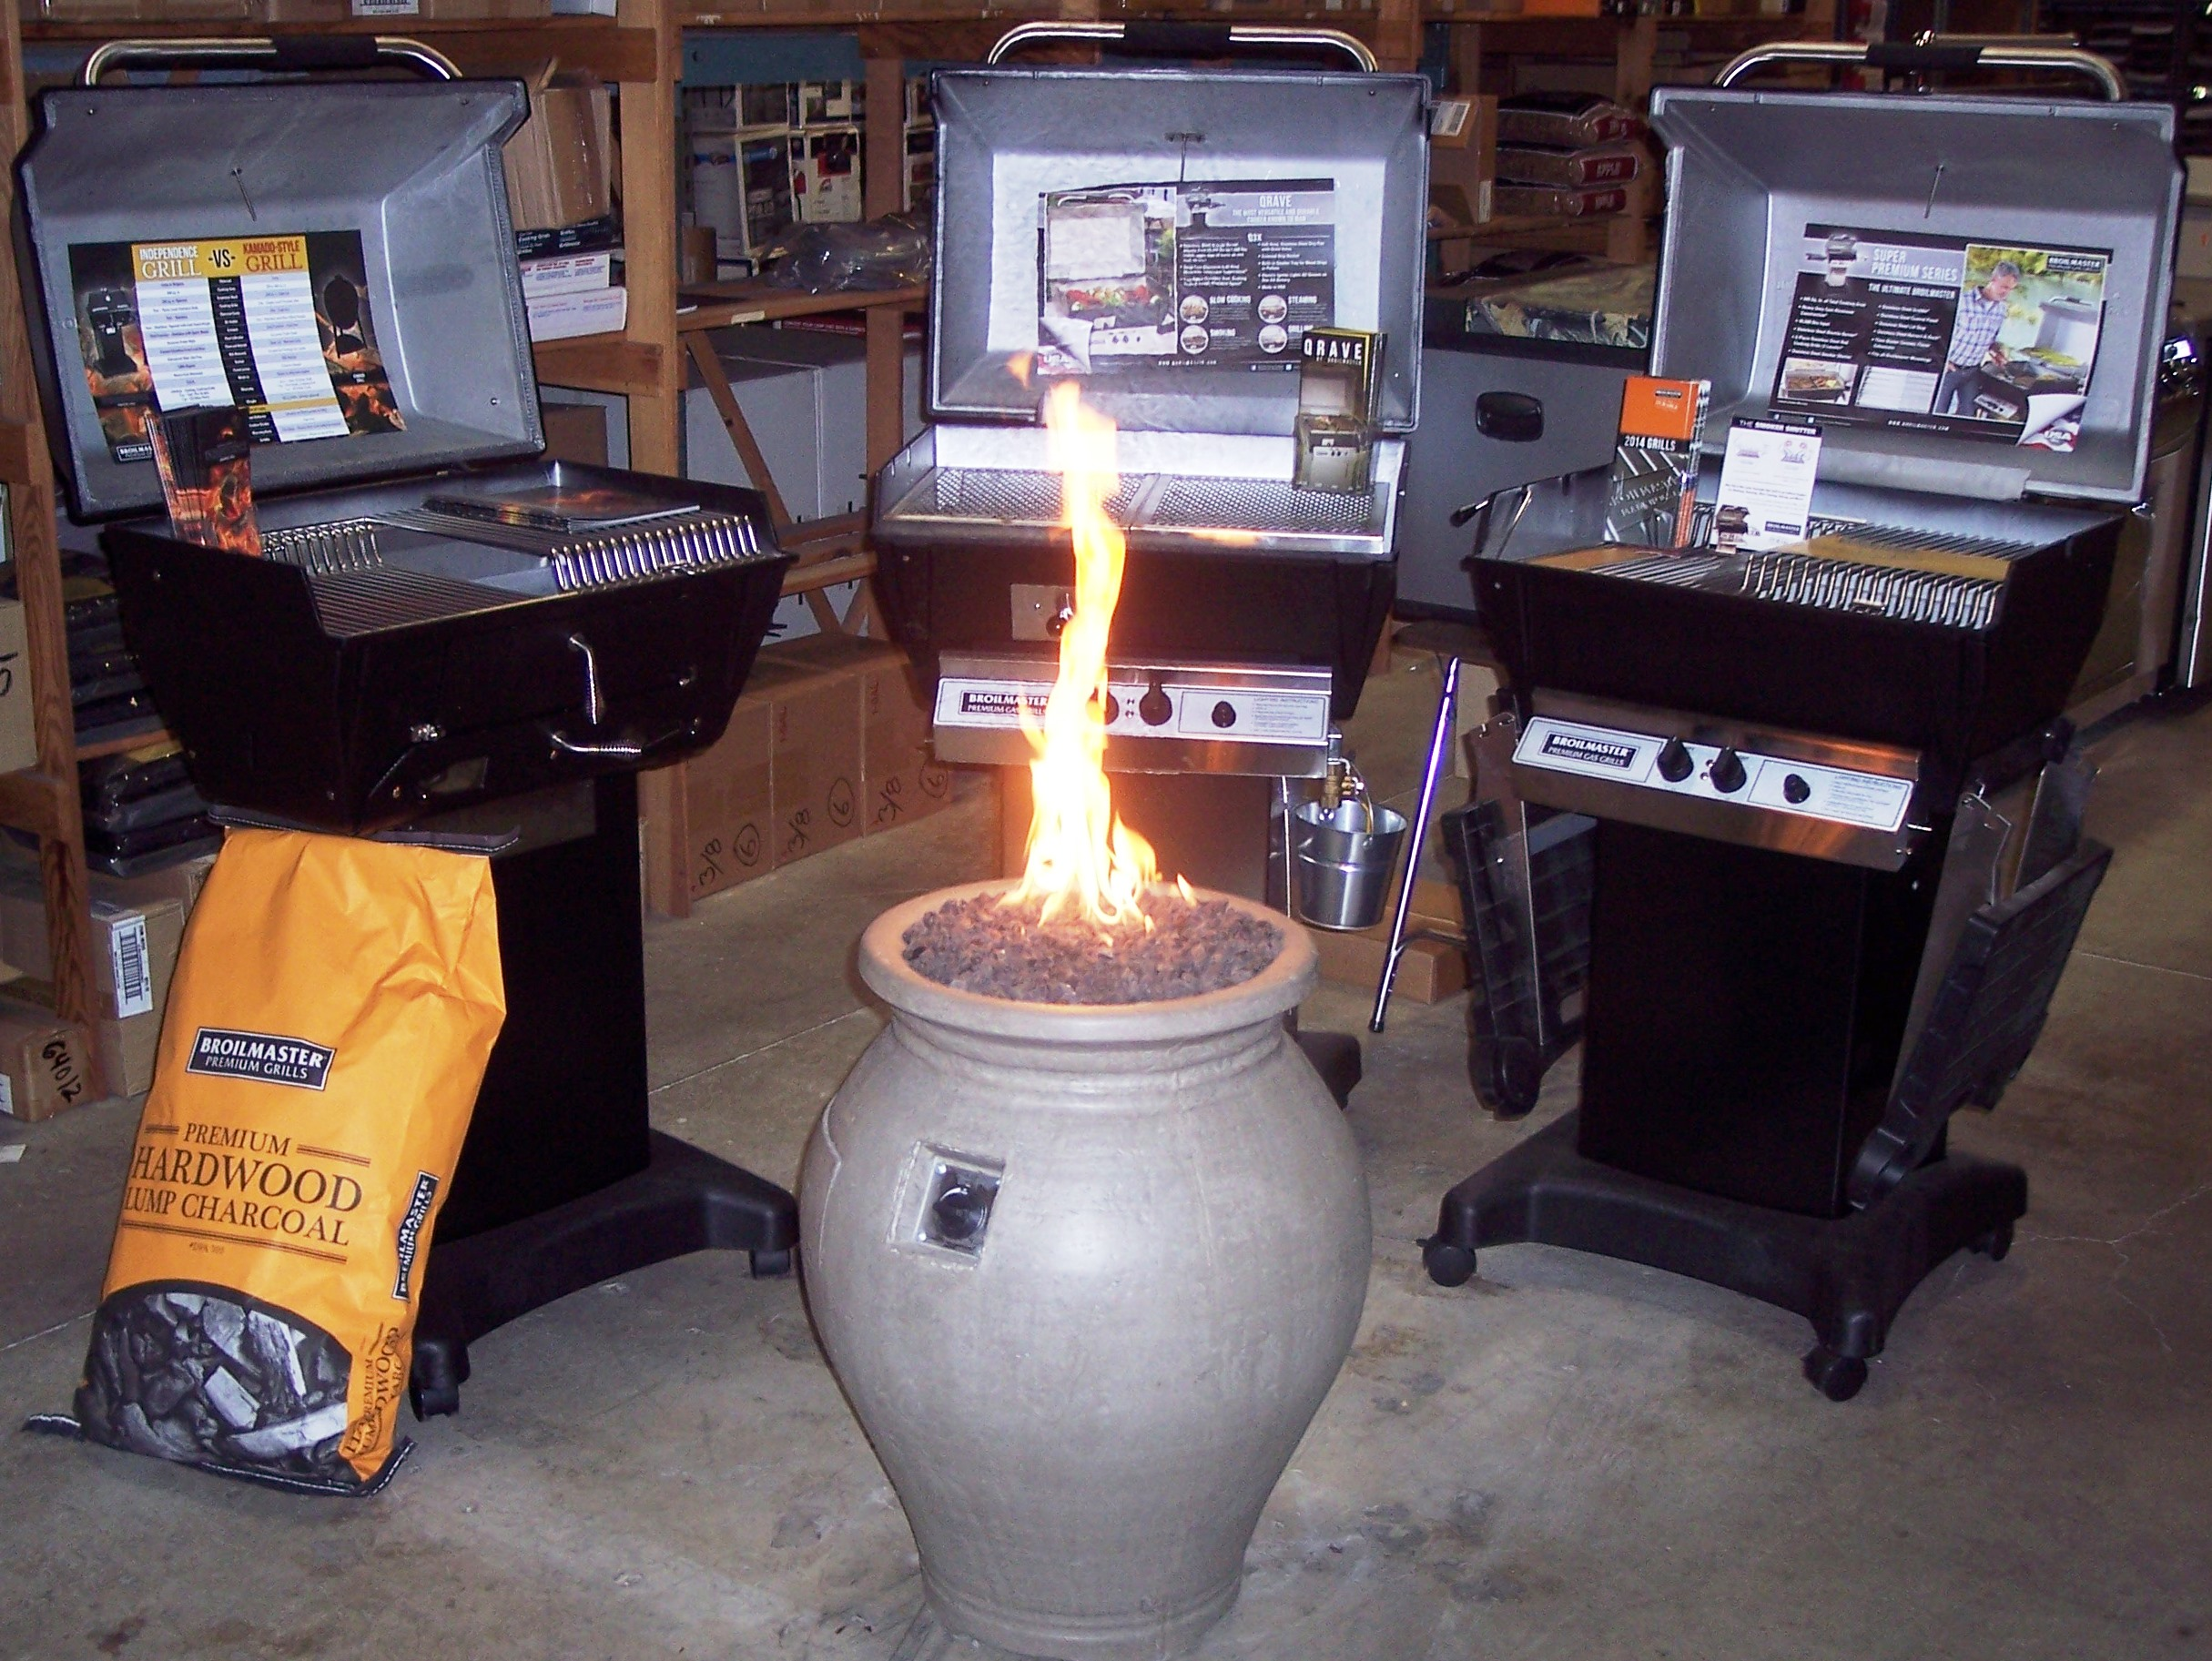 Broilmaster Grills and American Fyre Designs Amphora Urn